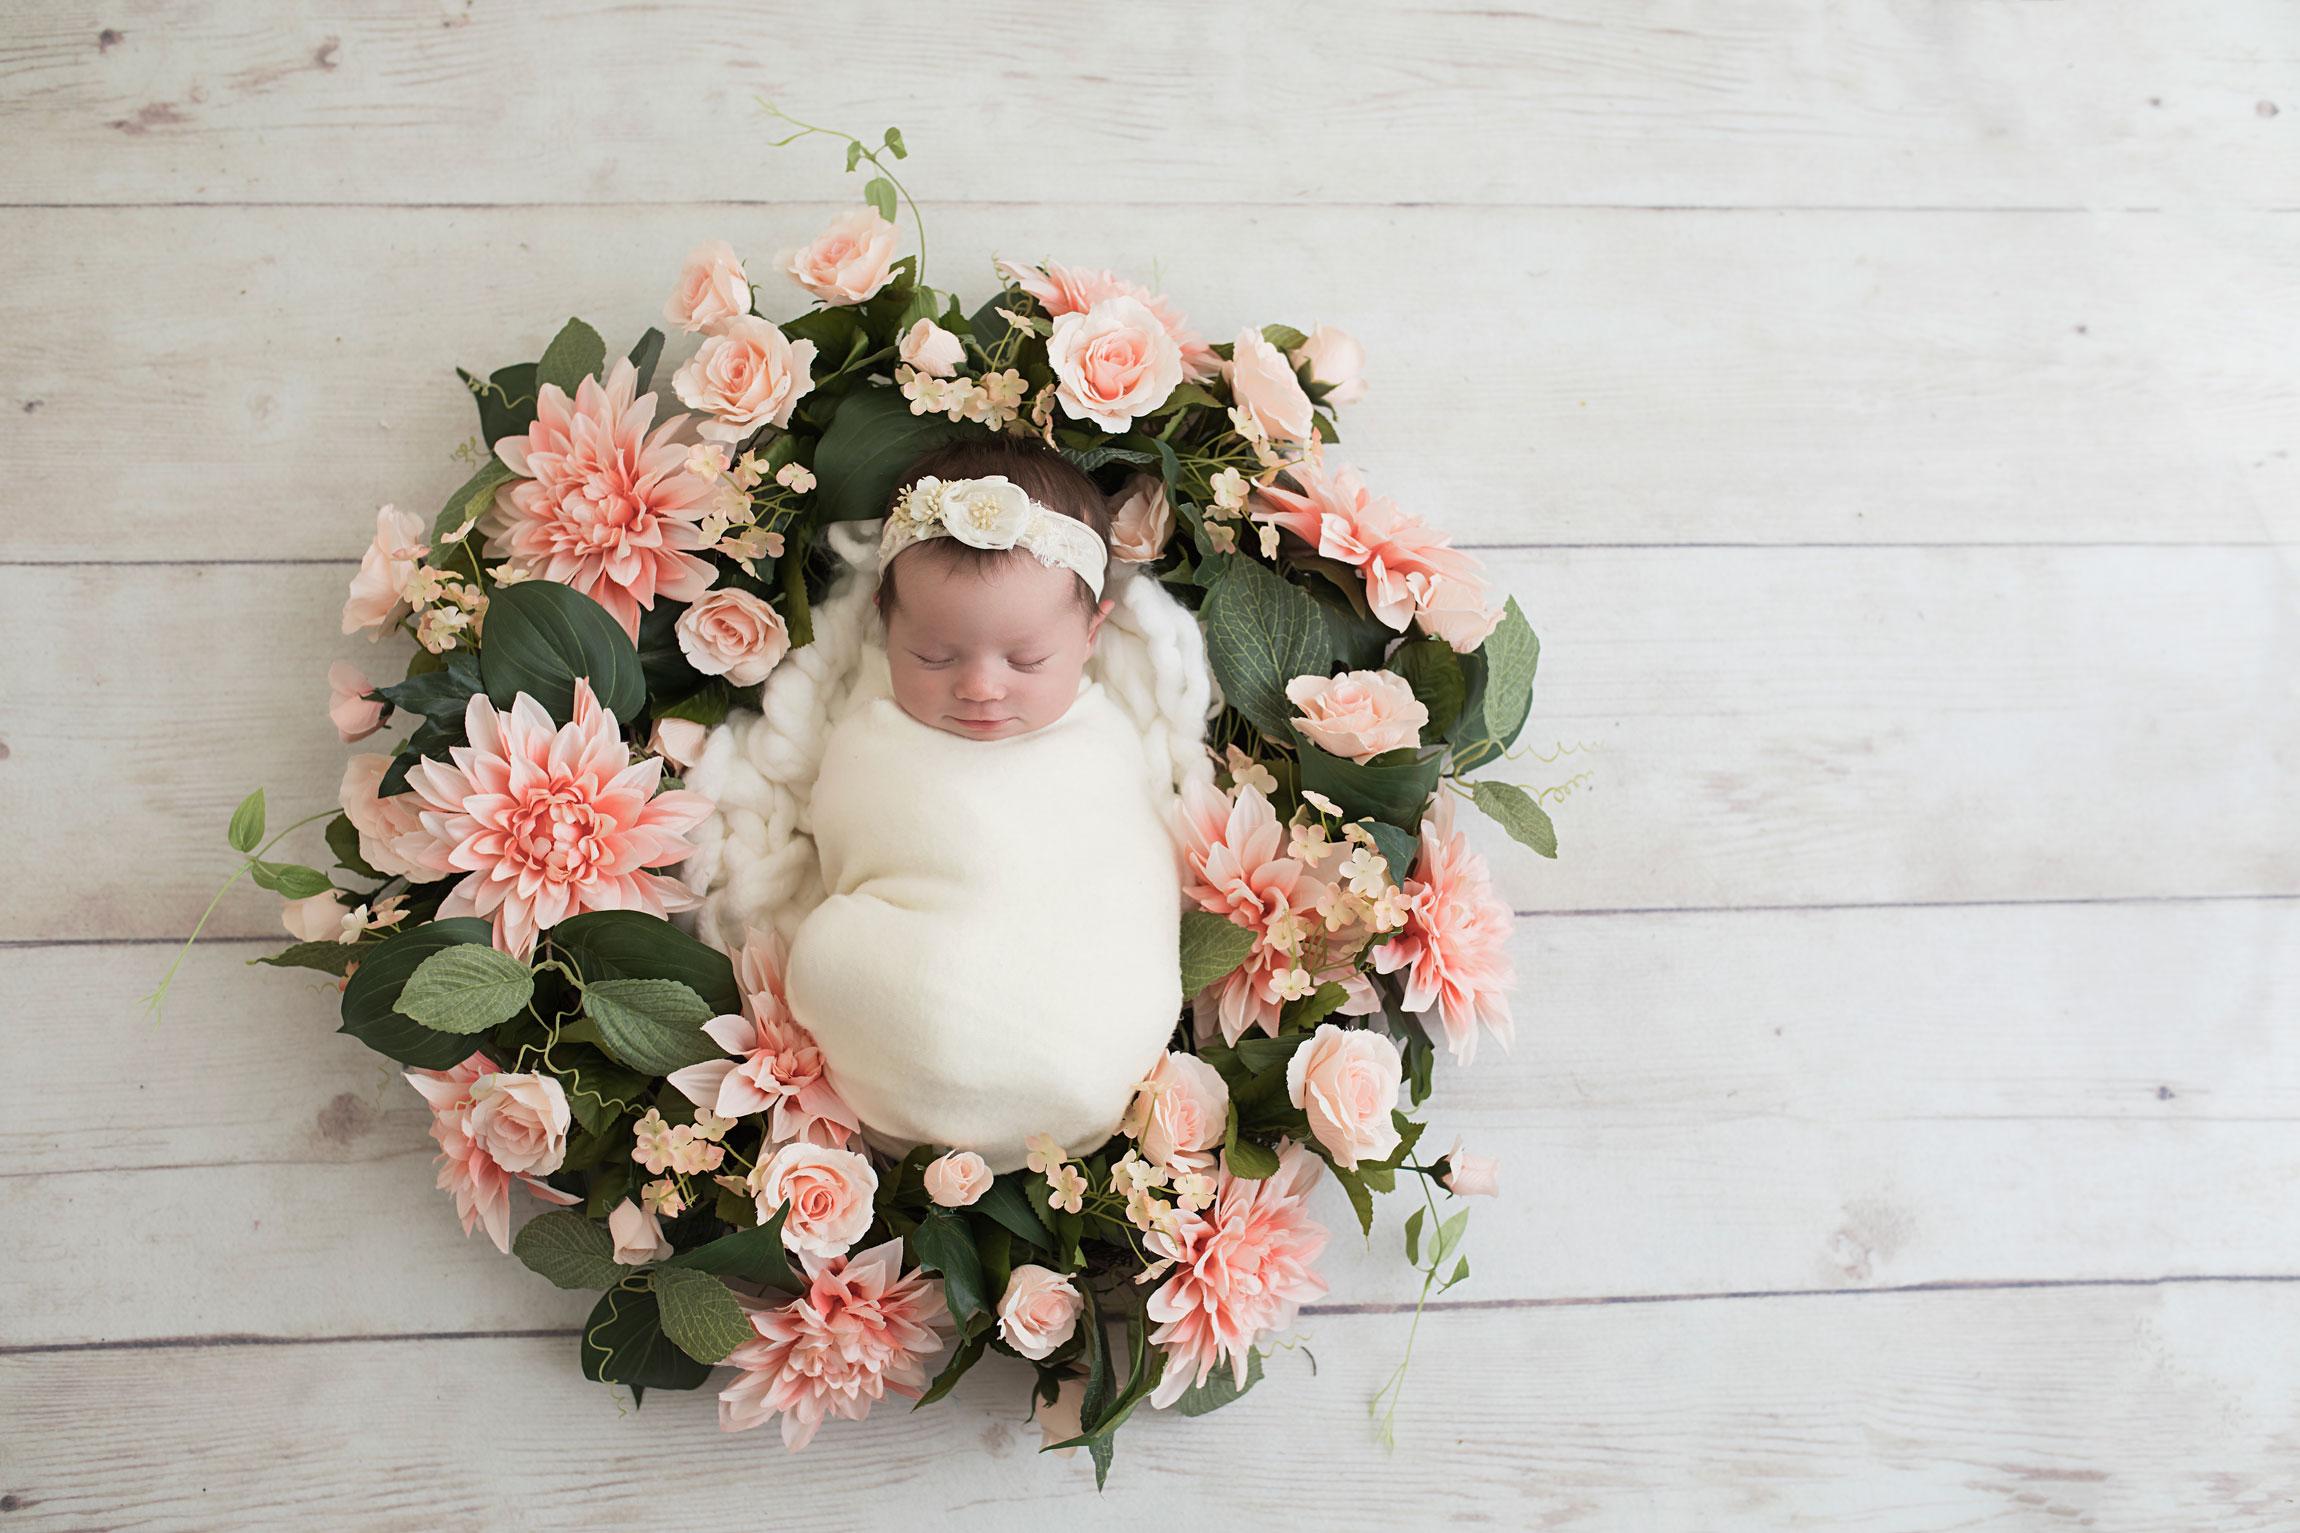 knoxville-newborn-in-wreath-pink-flowers.jpg